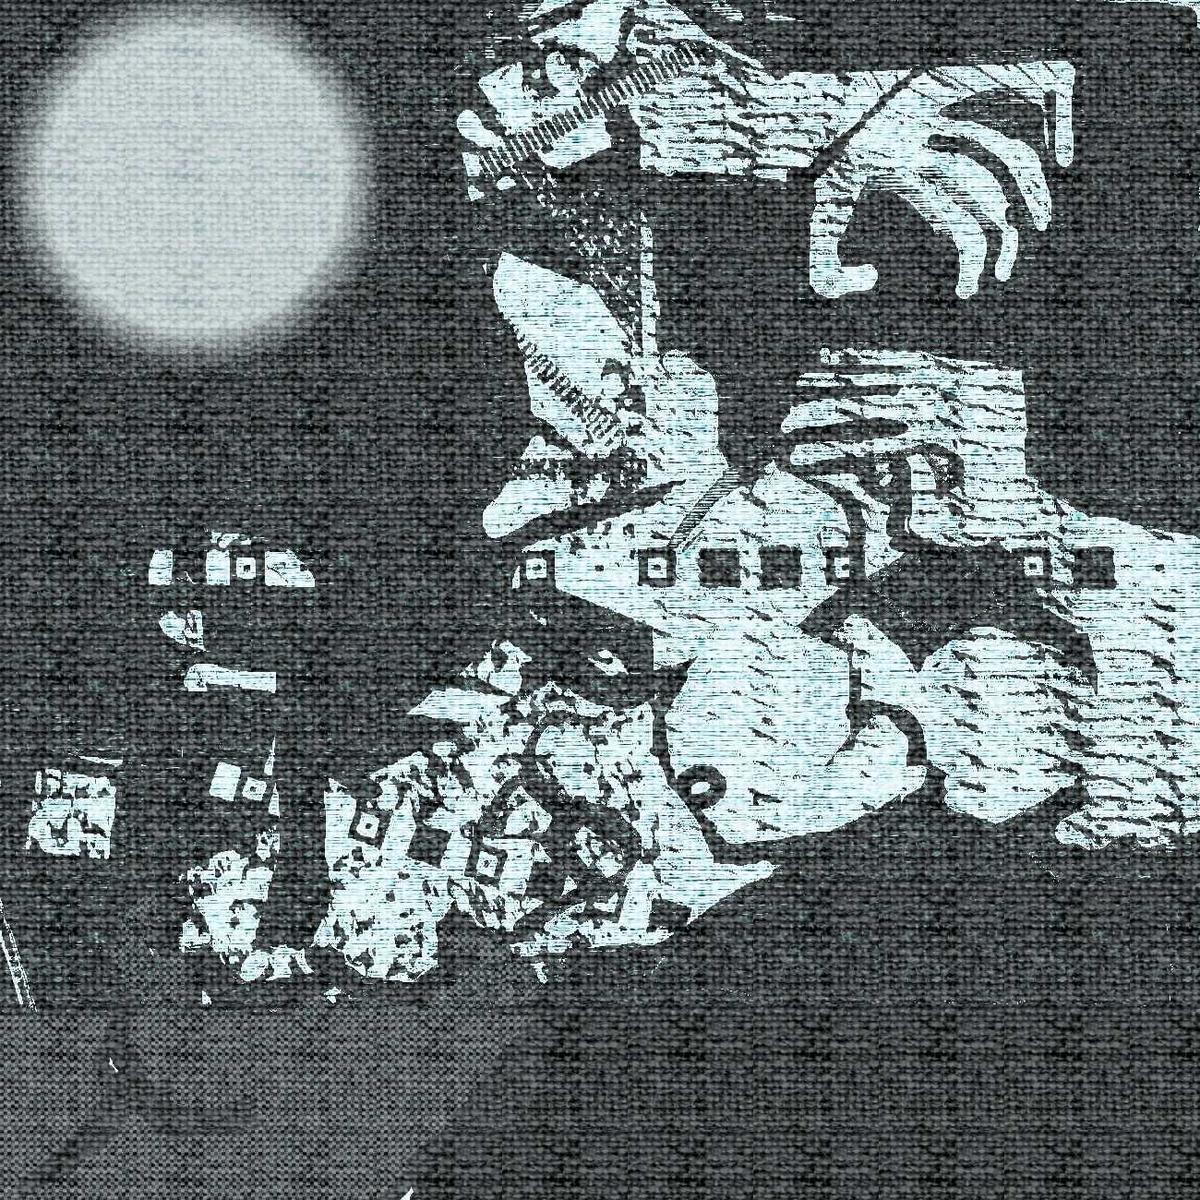 f:id:iwasisanma:20200122145721j:plain